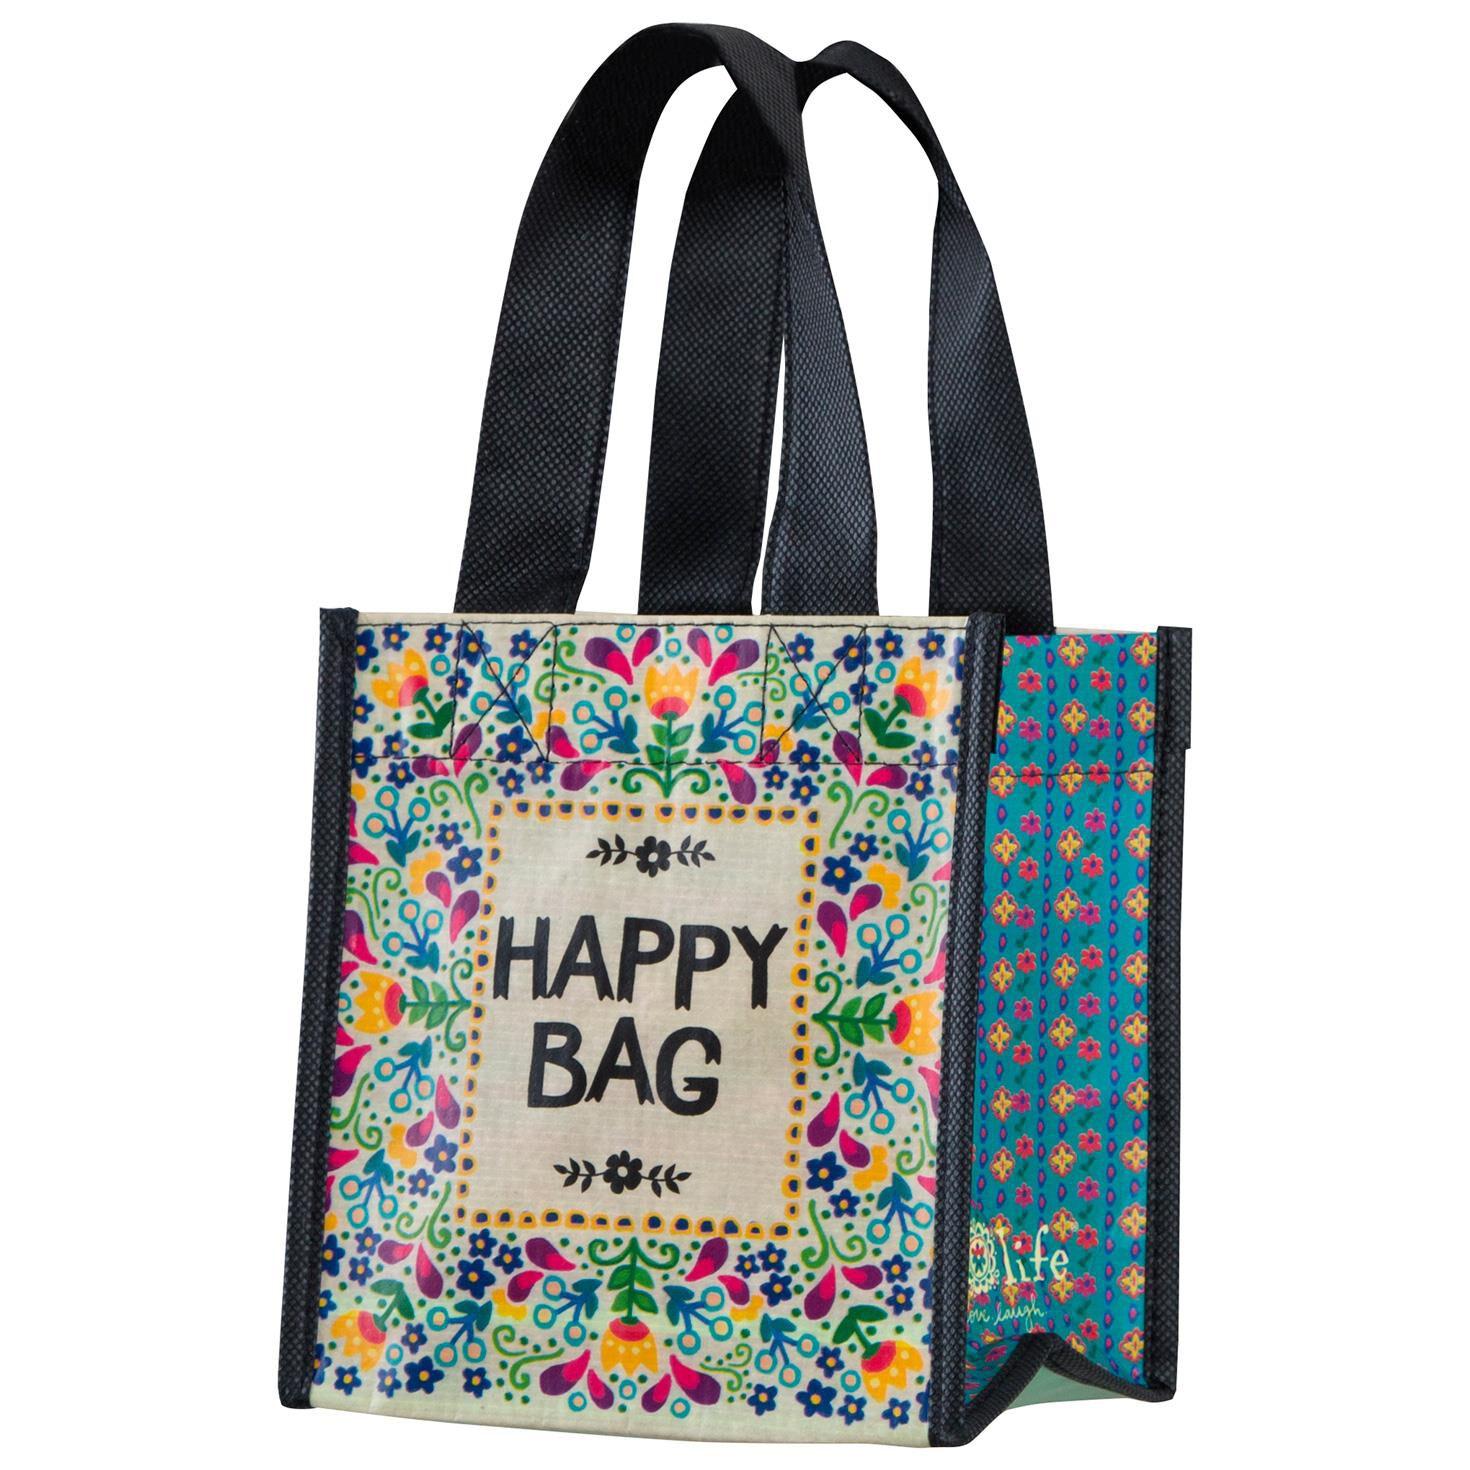 343755c9f0 Natural-Life-Happy-Bag-Small-Reusable-Gift-Bag-root-GBAG060_GBAG060_1470_1.jpg_Source_Image.jpg